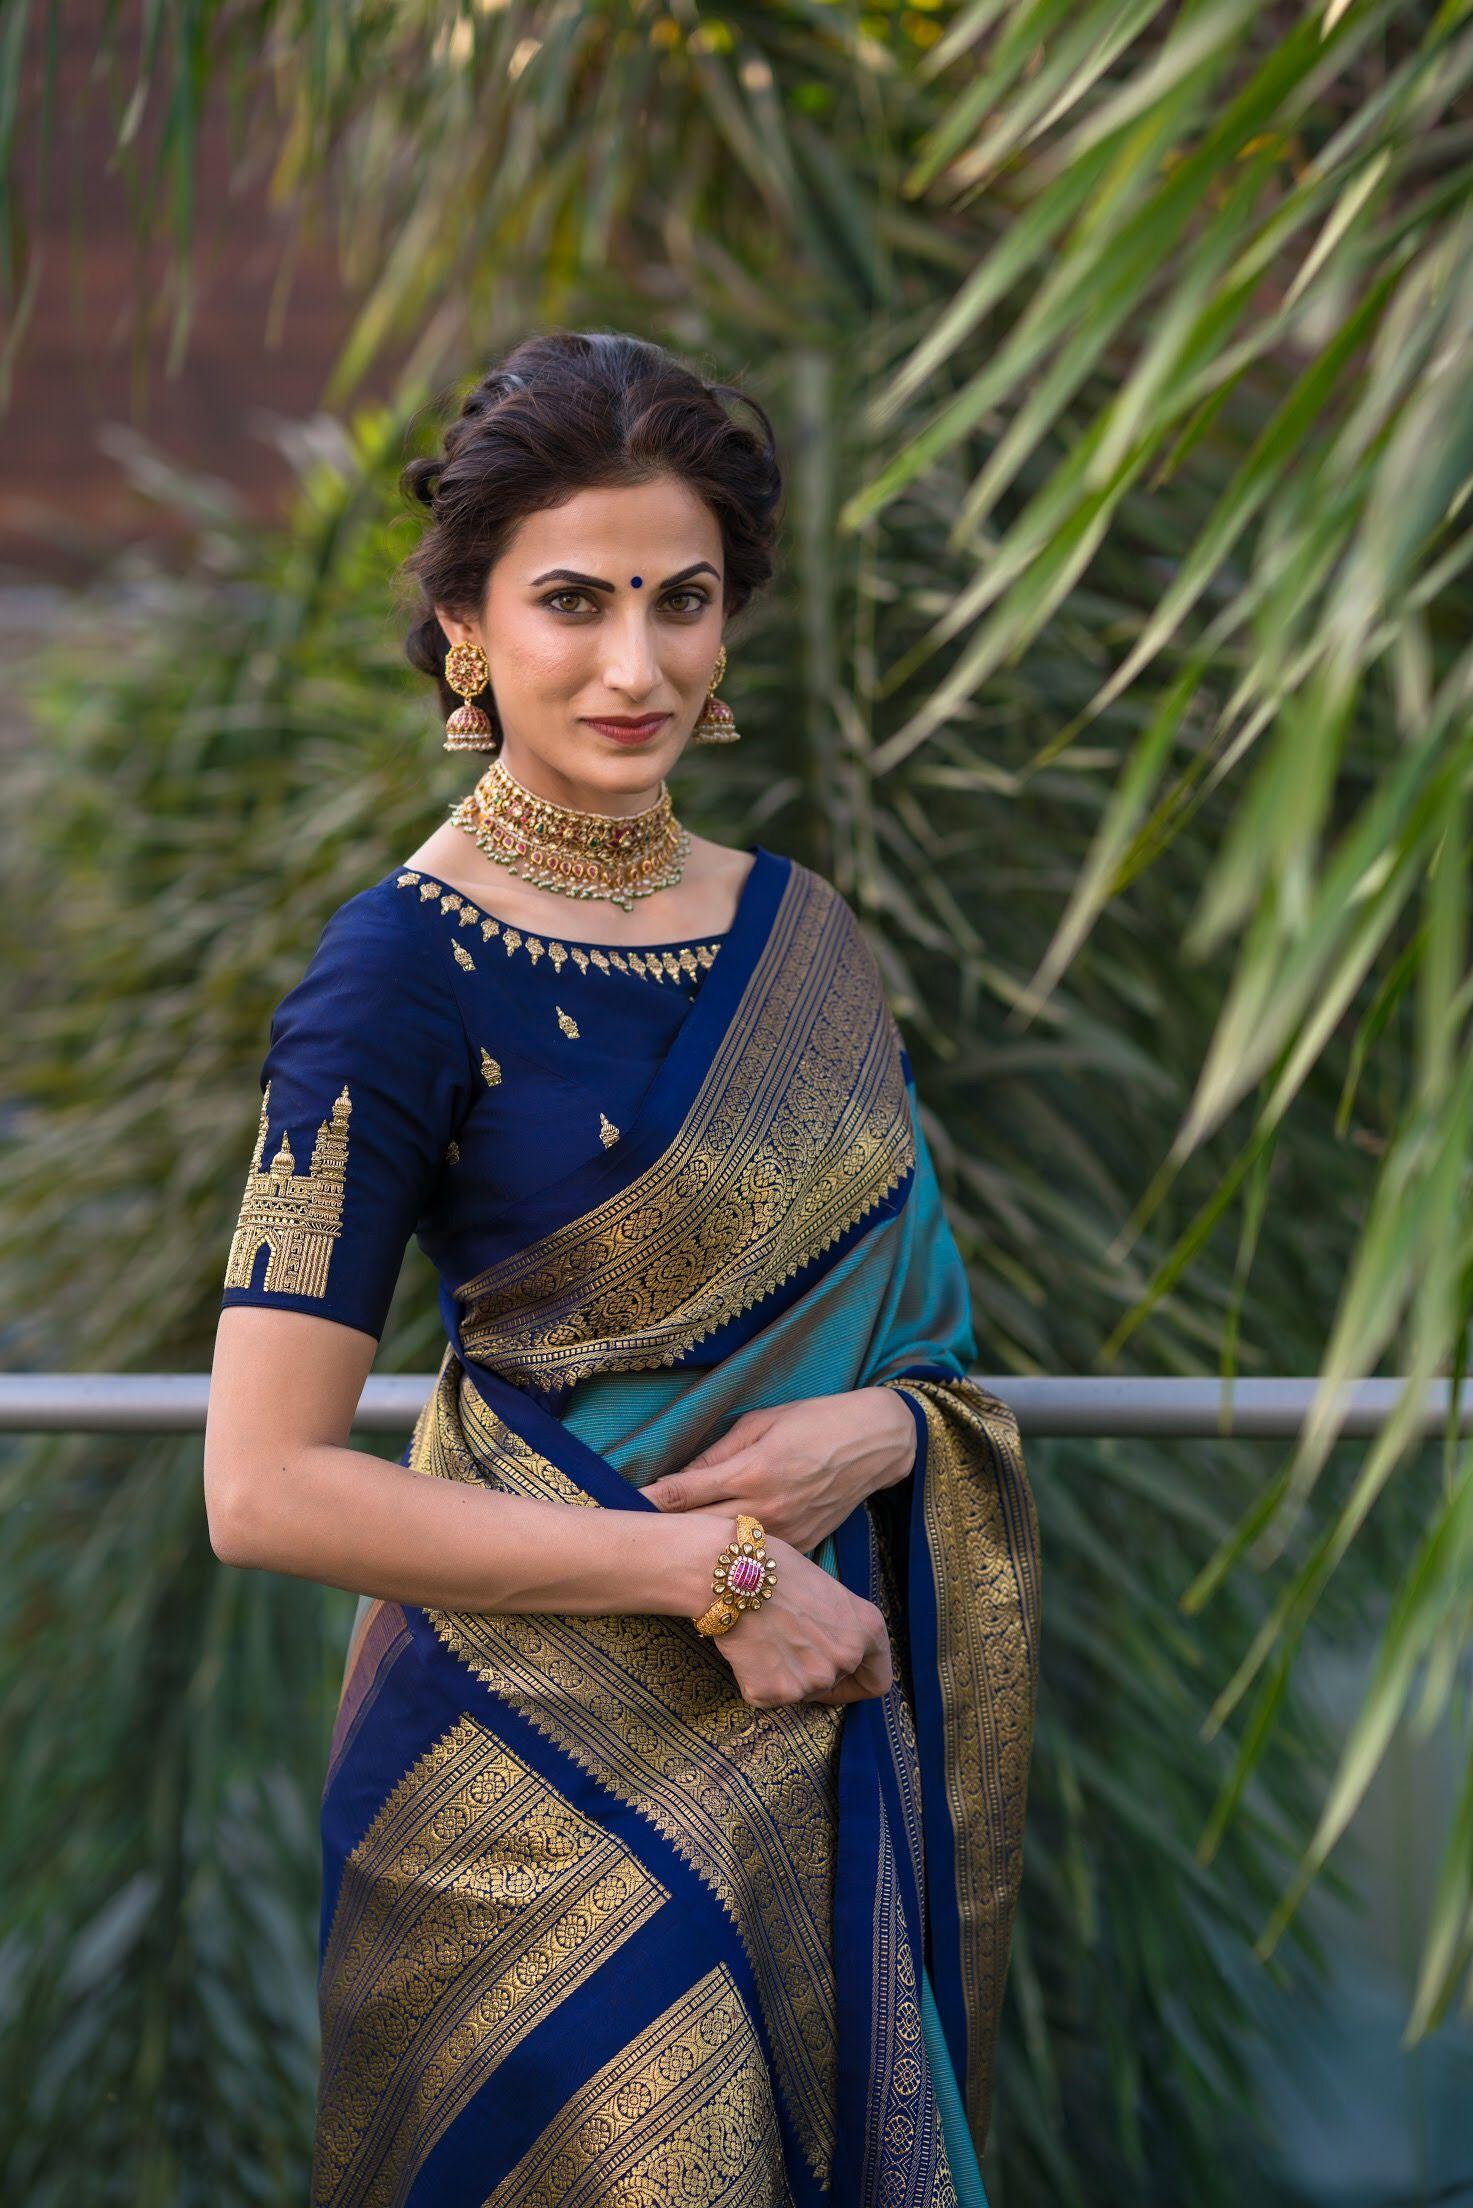 Design of saree blouse perfect blouse design being hyderabadi  style  pinterest  blouse